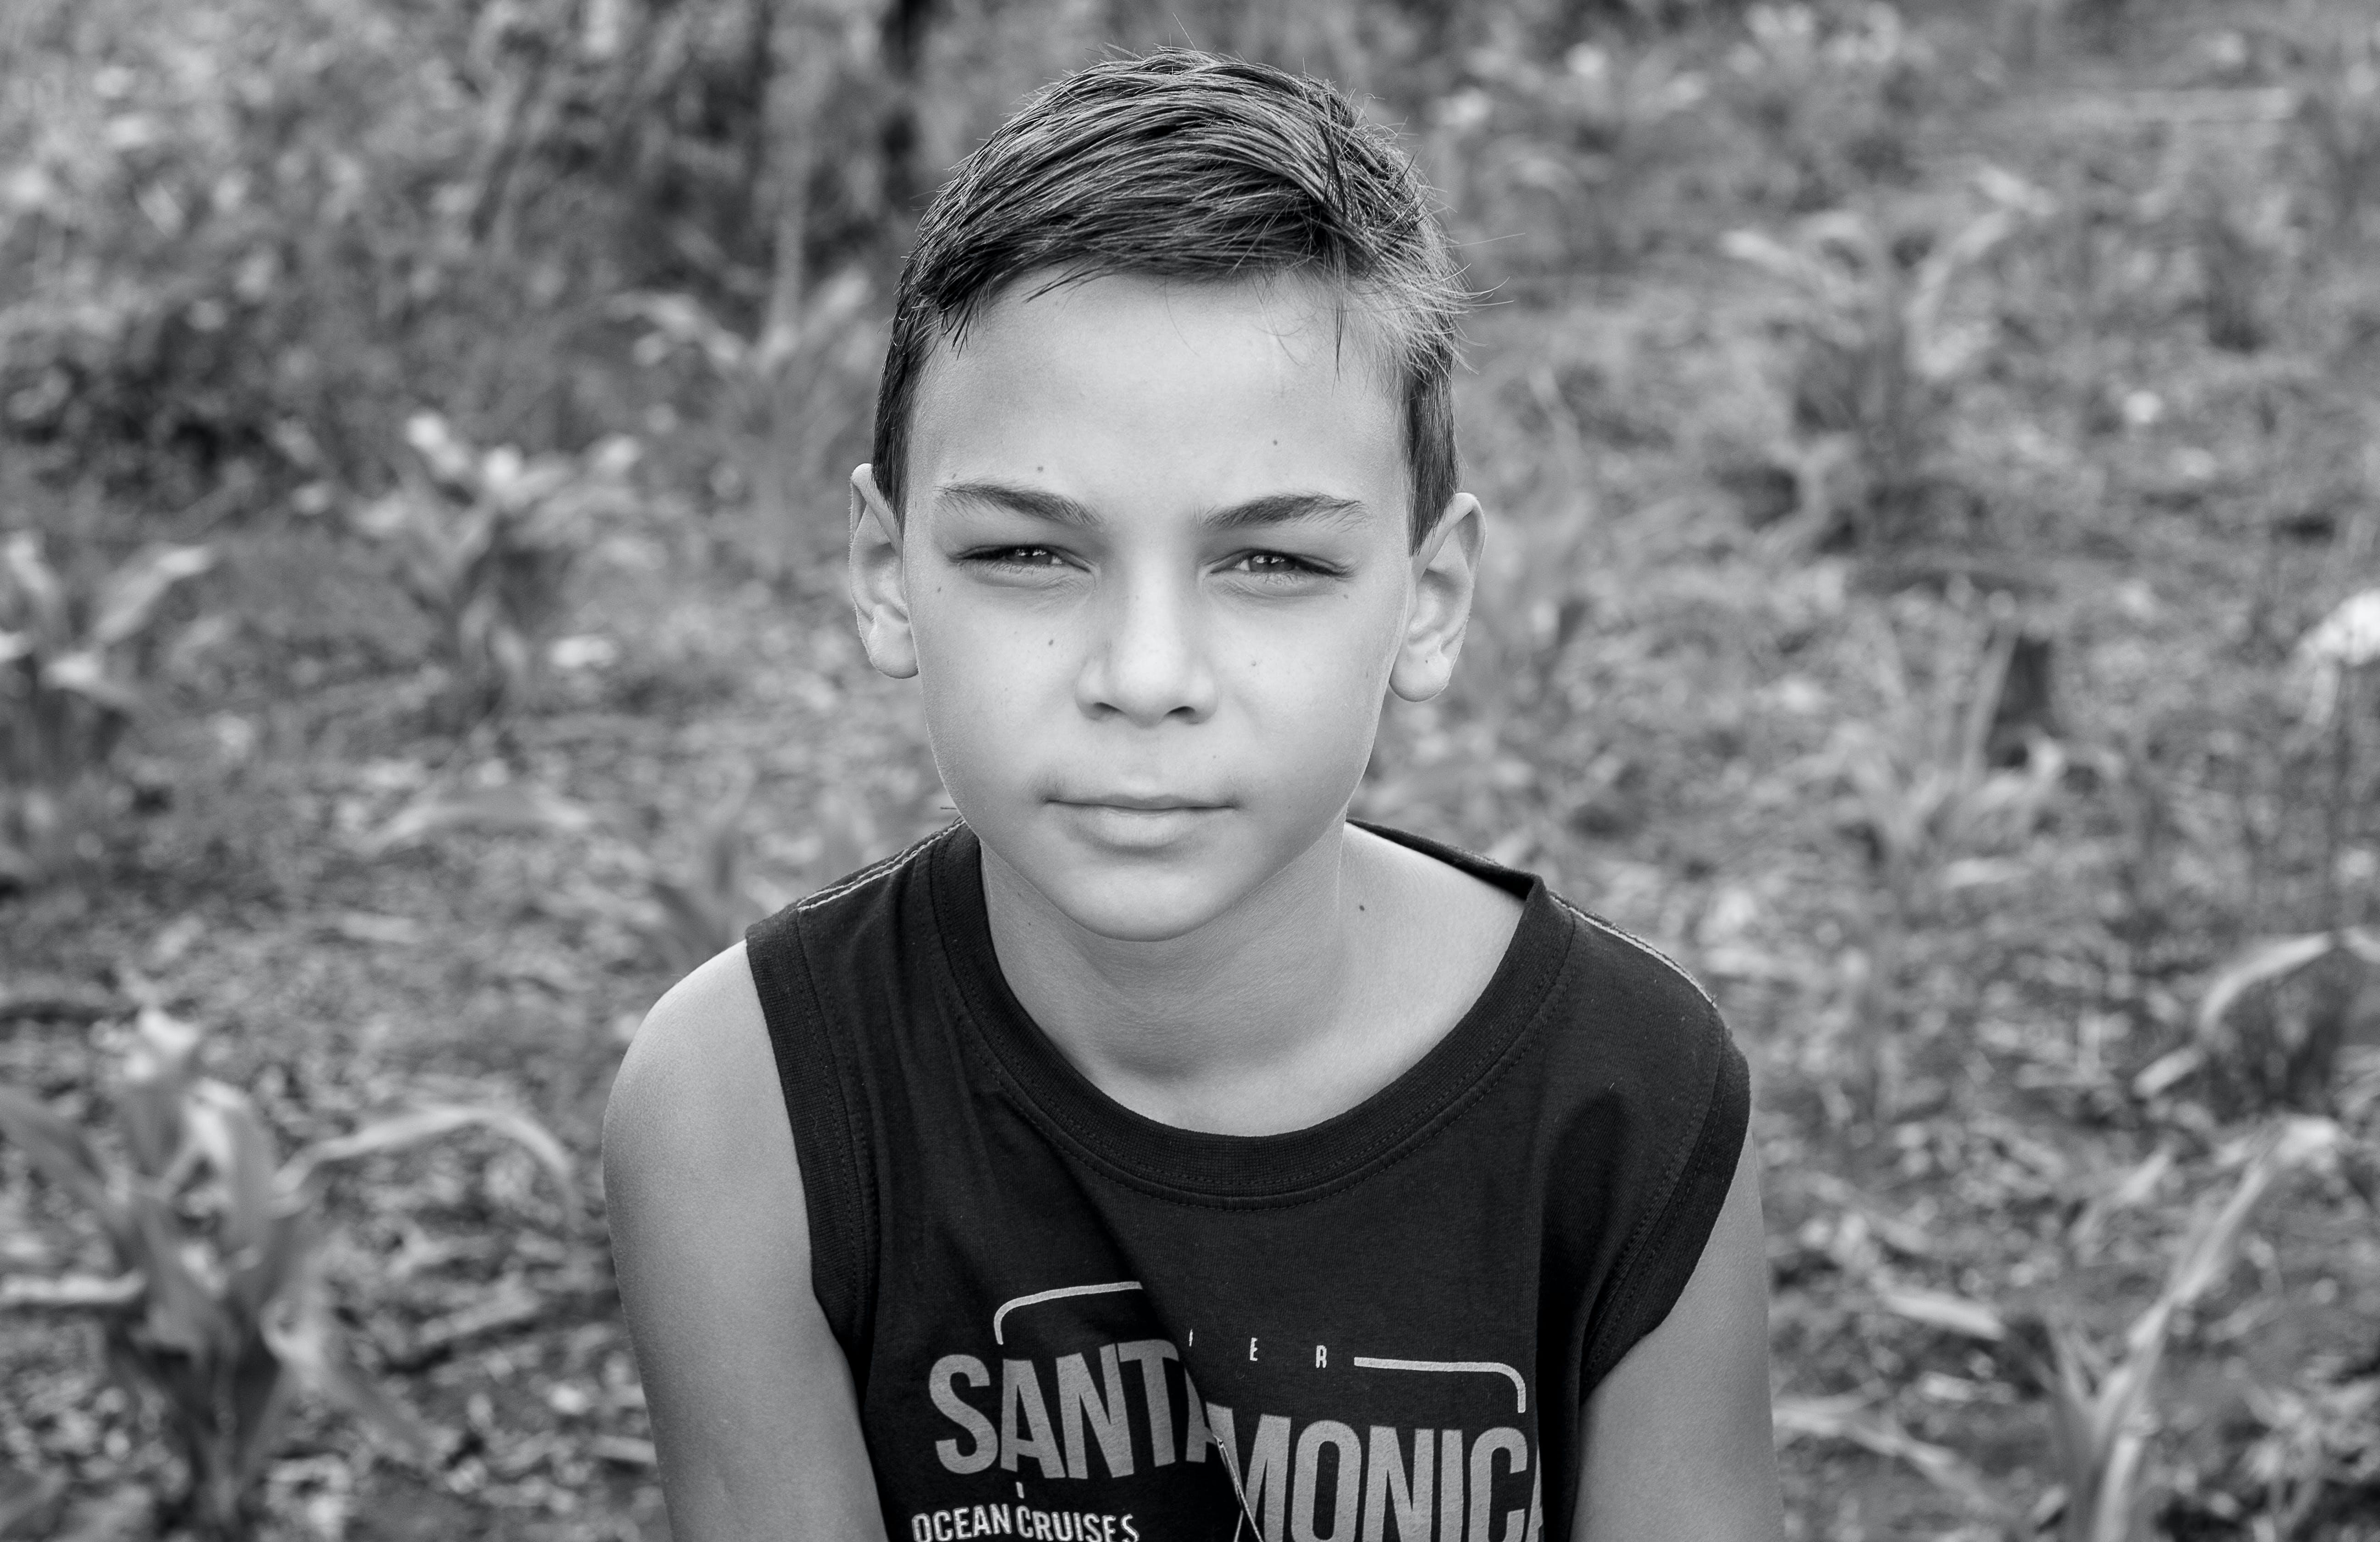 Boy Wearing Santamonic-printed Sleeveless Shirt